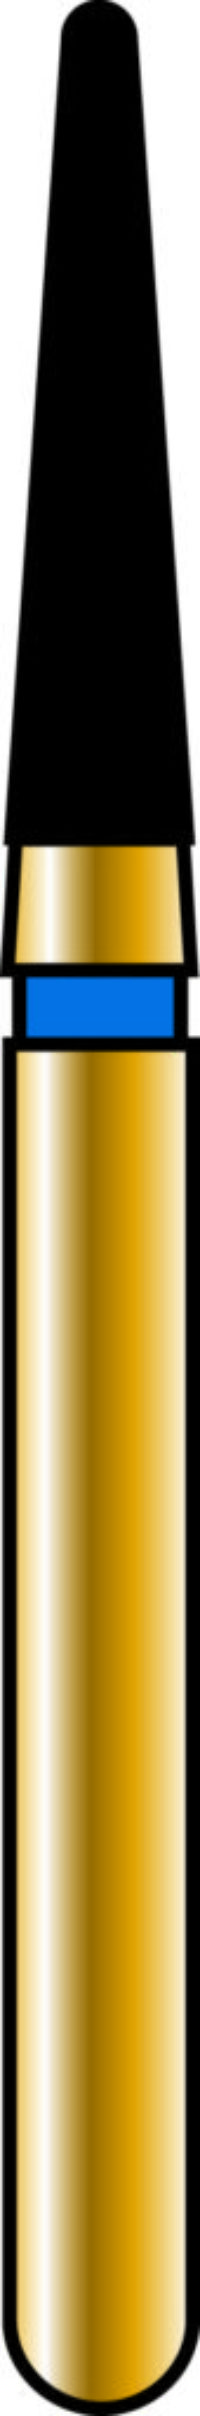 Round End Taper 16-7mm Gold Diamond Bur